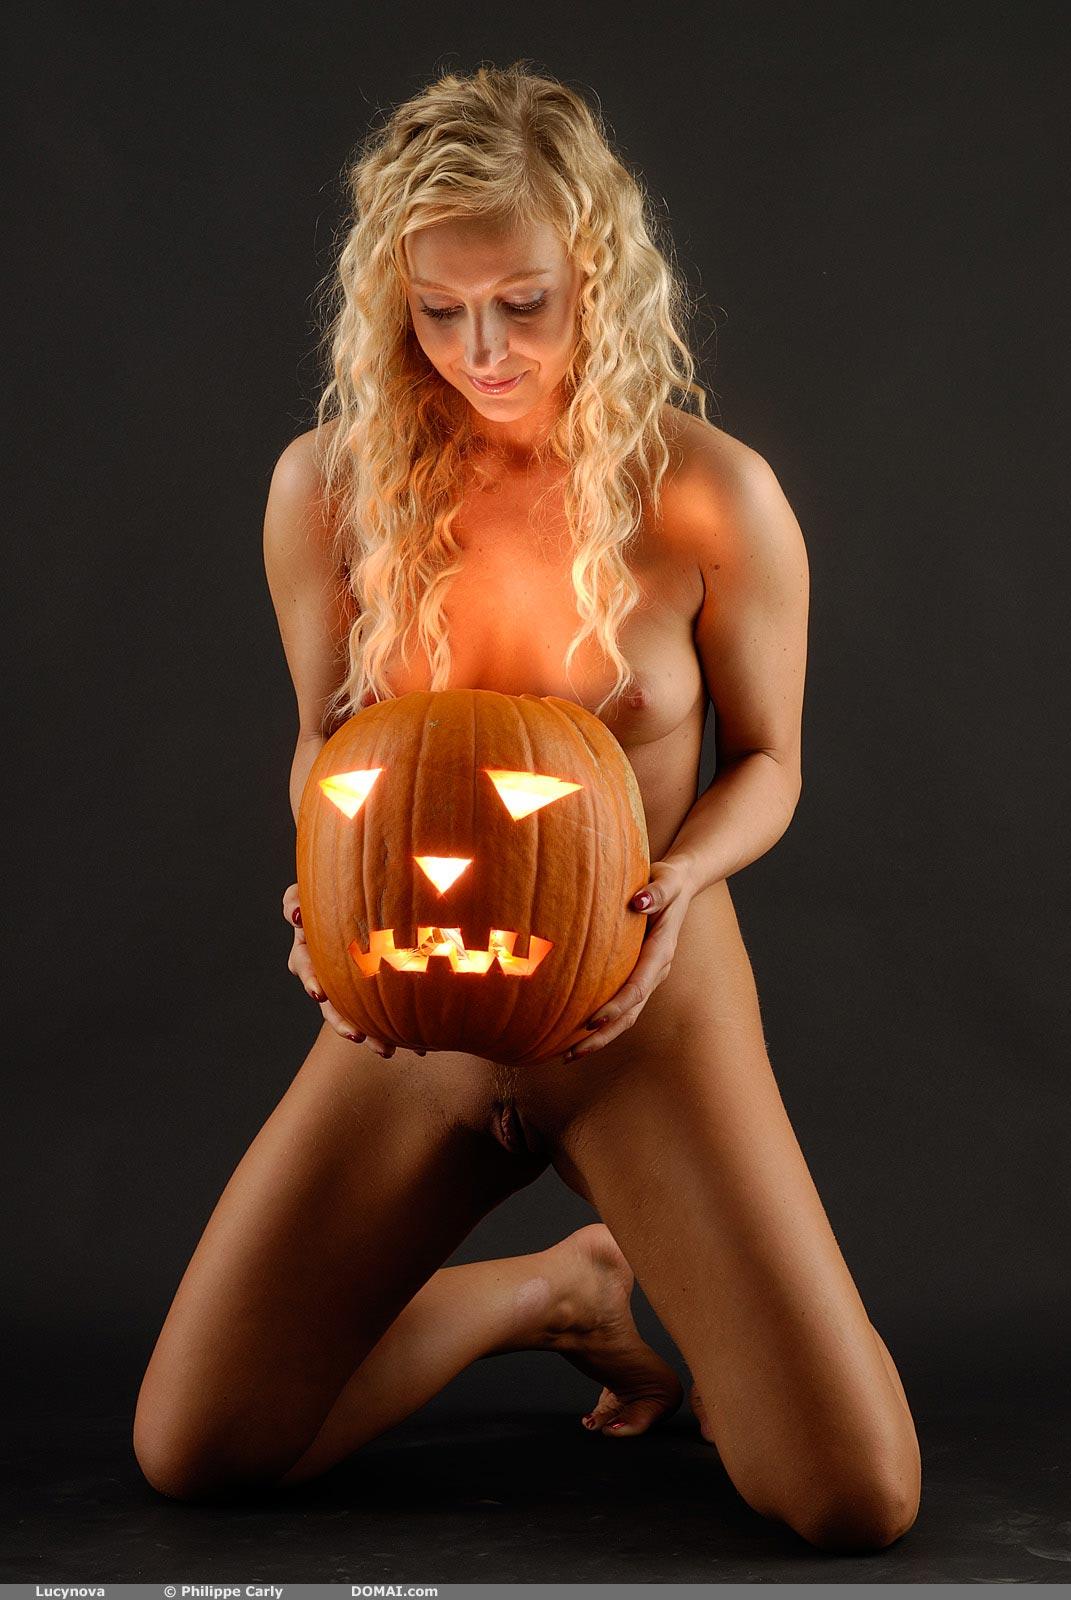 LucyNova Halloween - NudesPuri.com